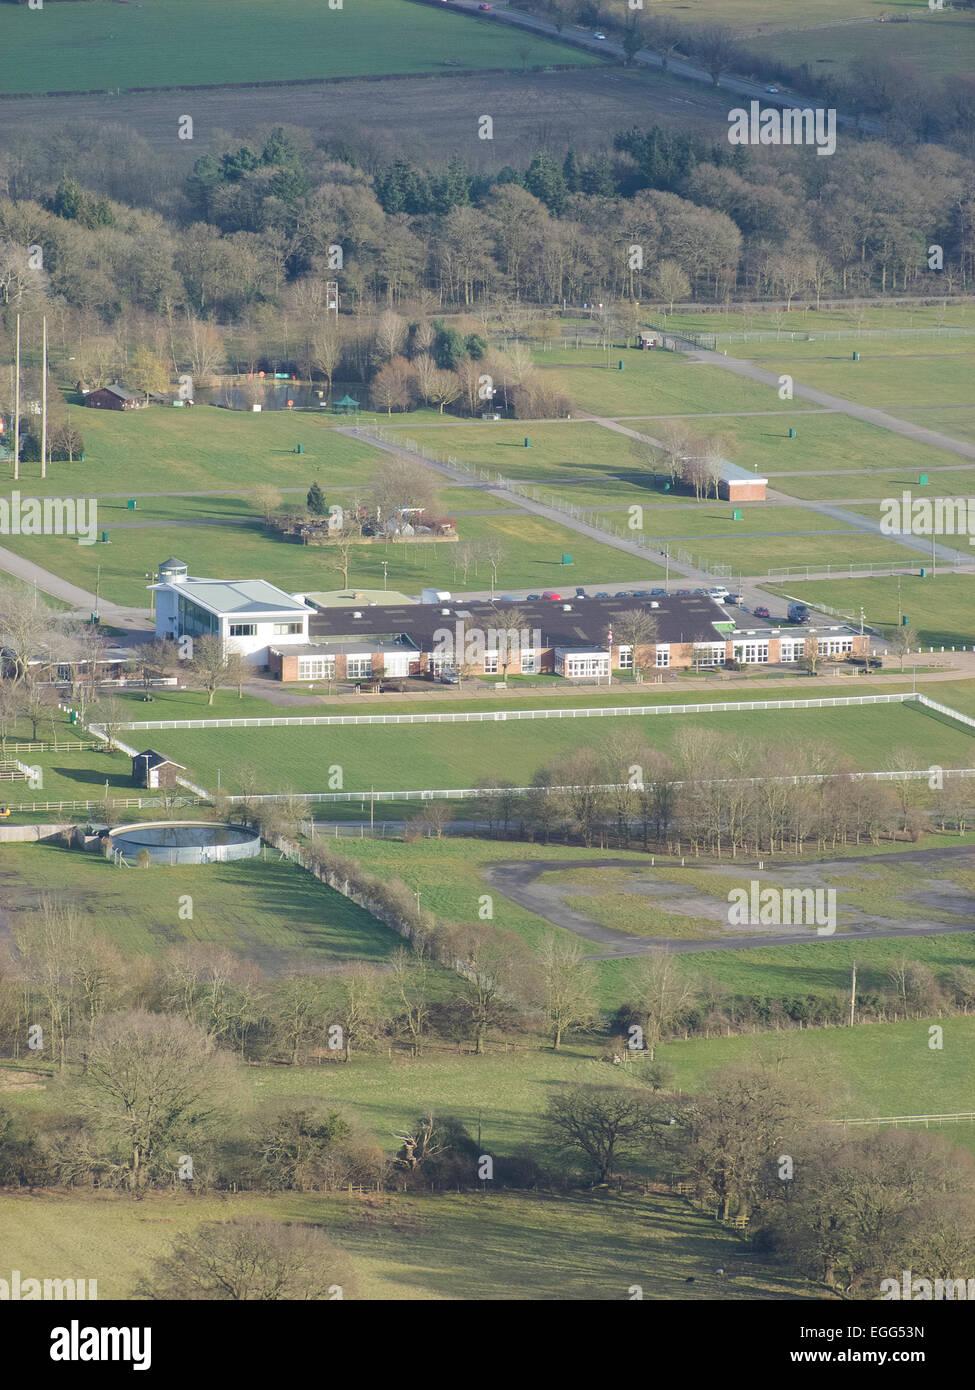 Three Counties Showground, Malvern Wells, Worcestershire, England, UK - Stock Image